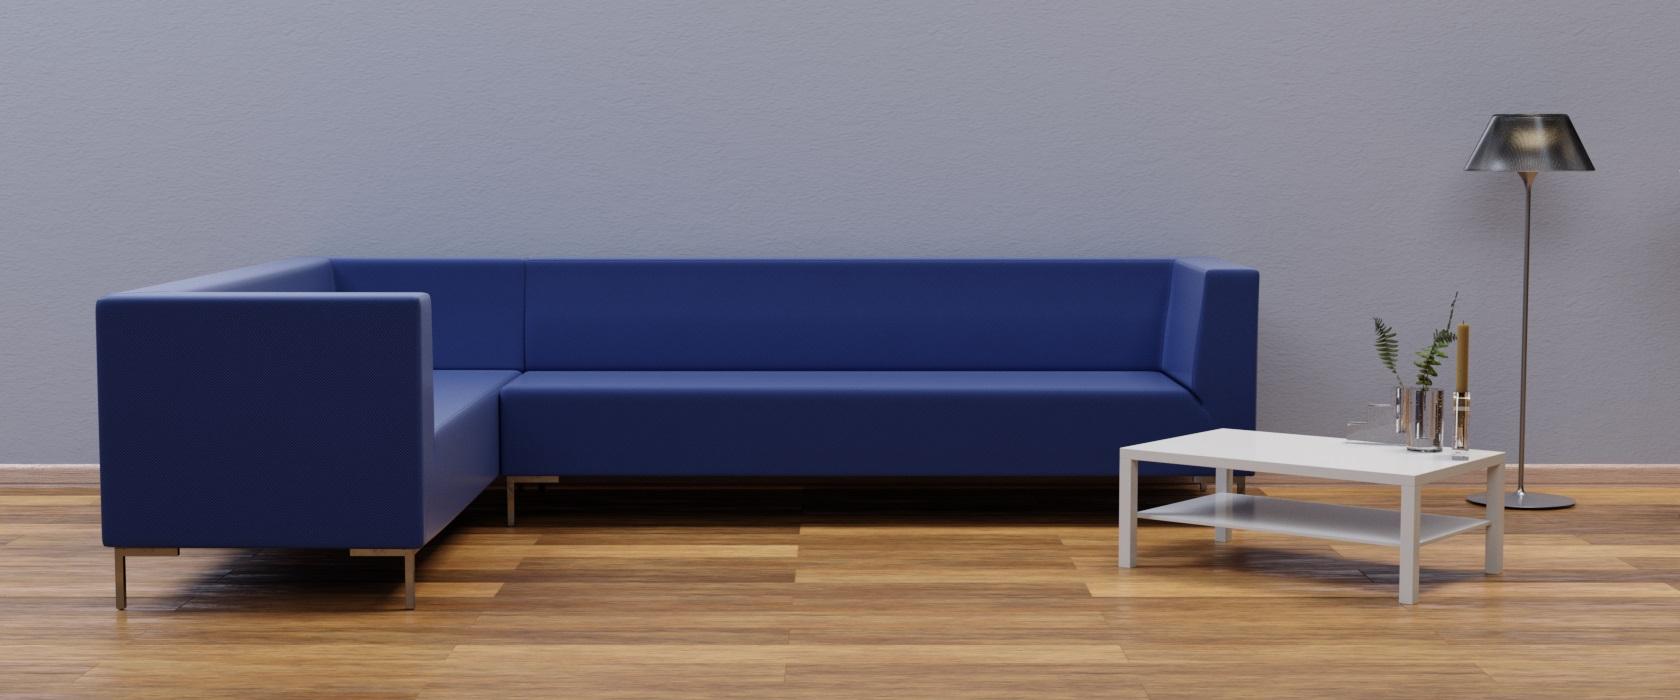 Кутовий диван Livorno Club - Фото 2 - Pufetto